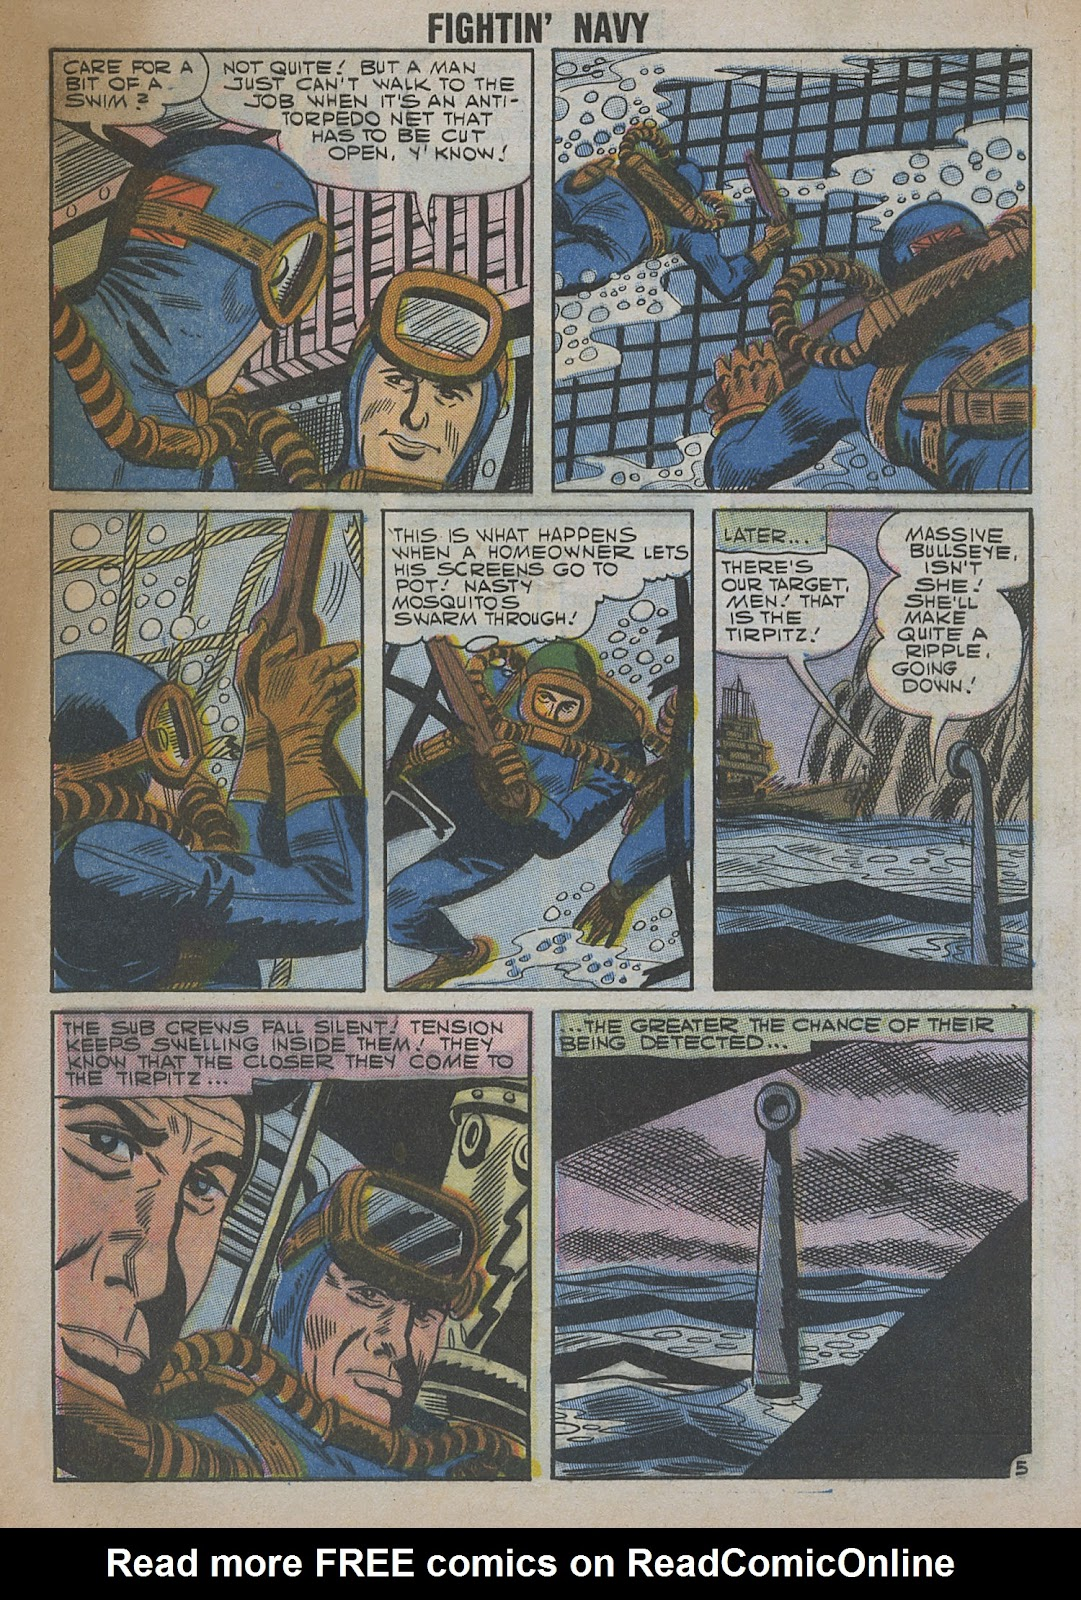 Read online Fightin' Navy comic -  Issue #82 - 63